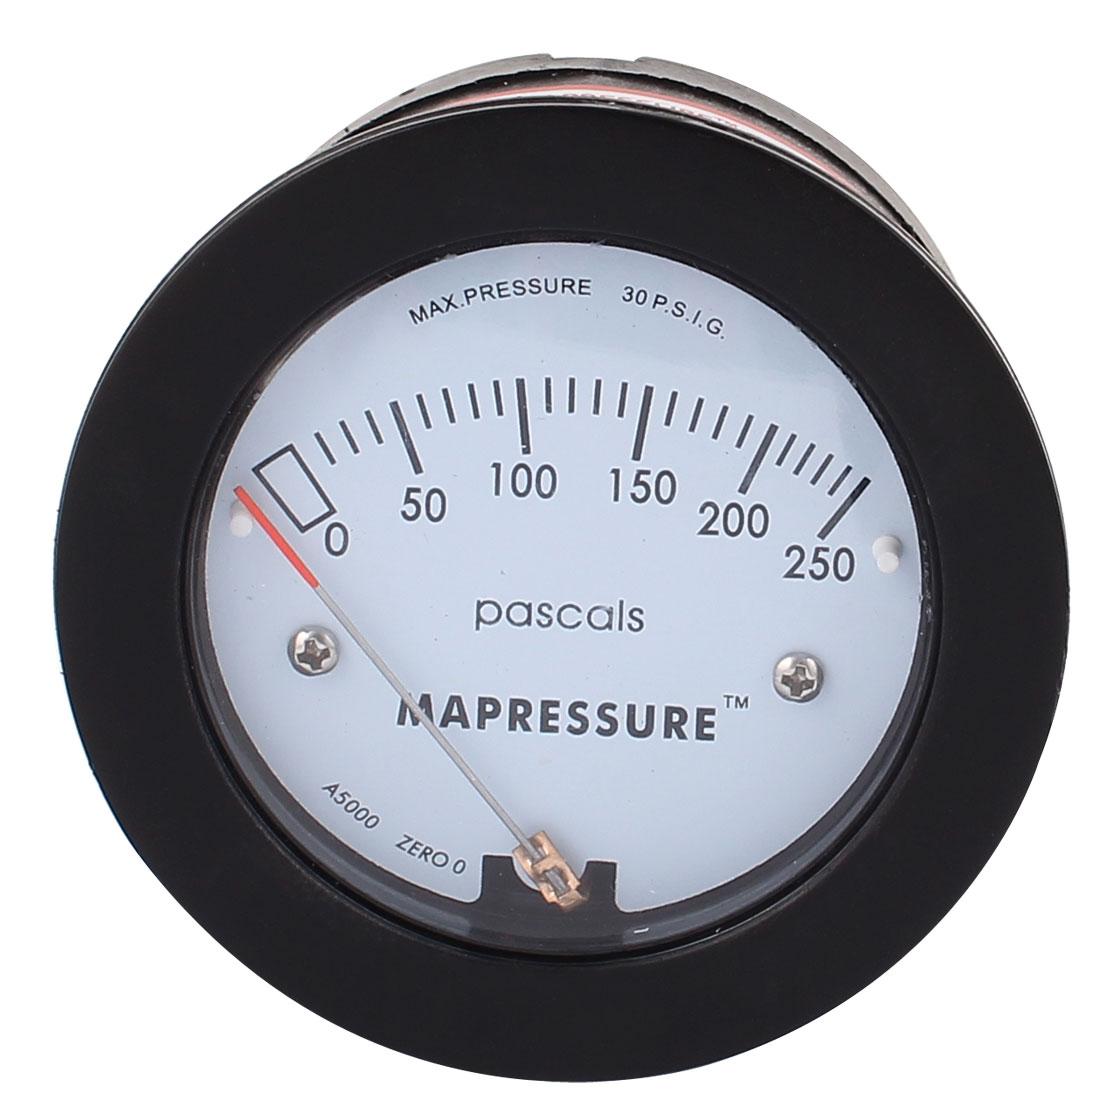 Series 5000 0-250Pa 30 PSIG Photohelic Differential Pressure Gauge Meter